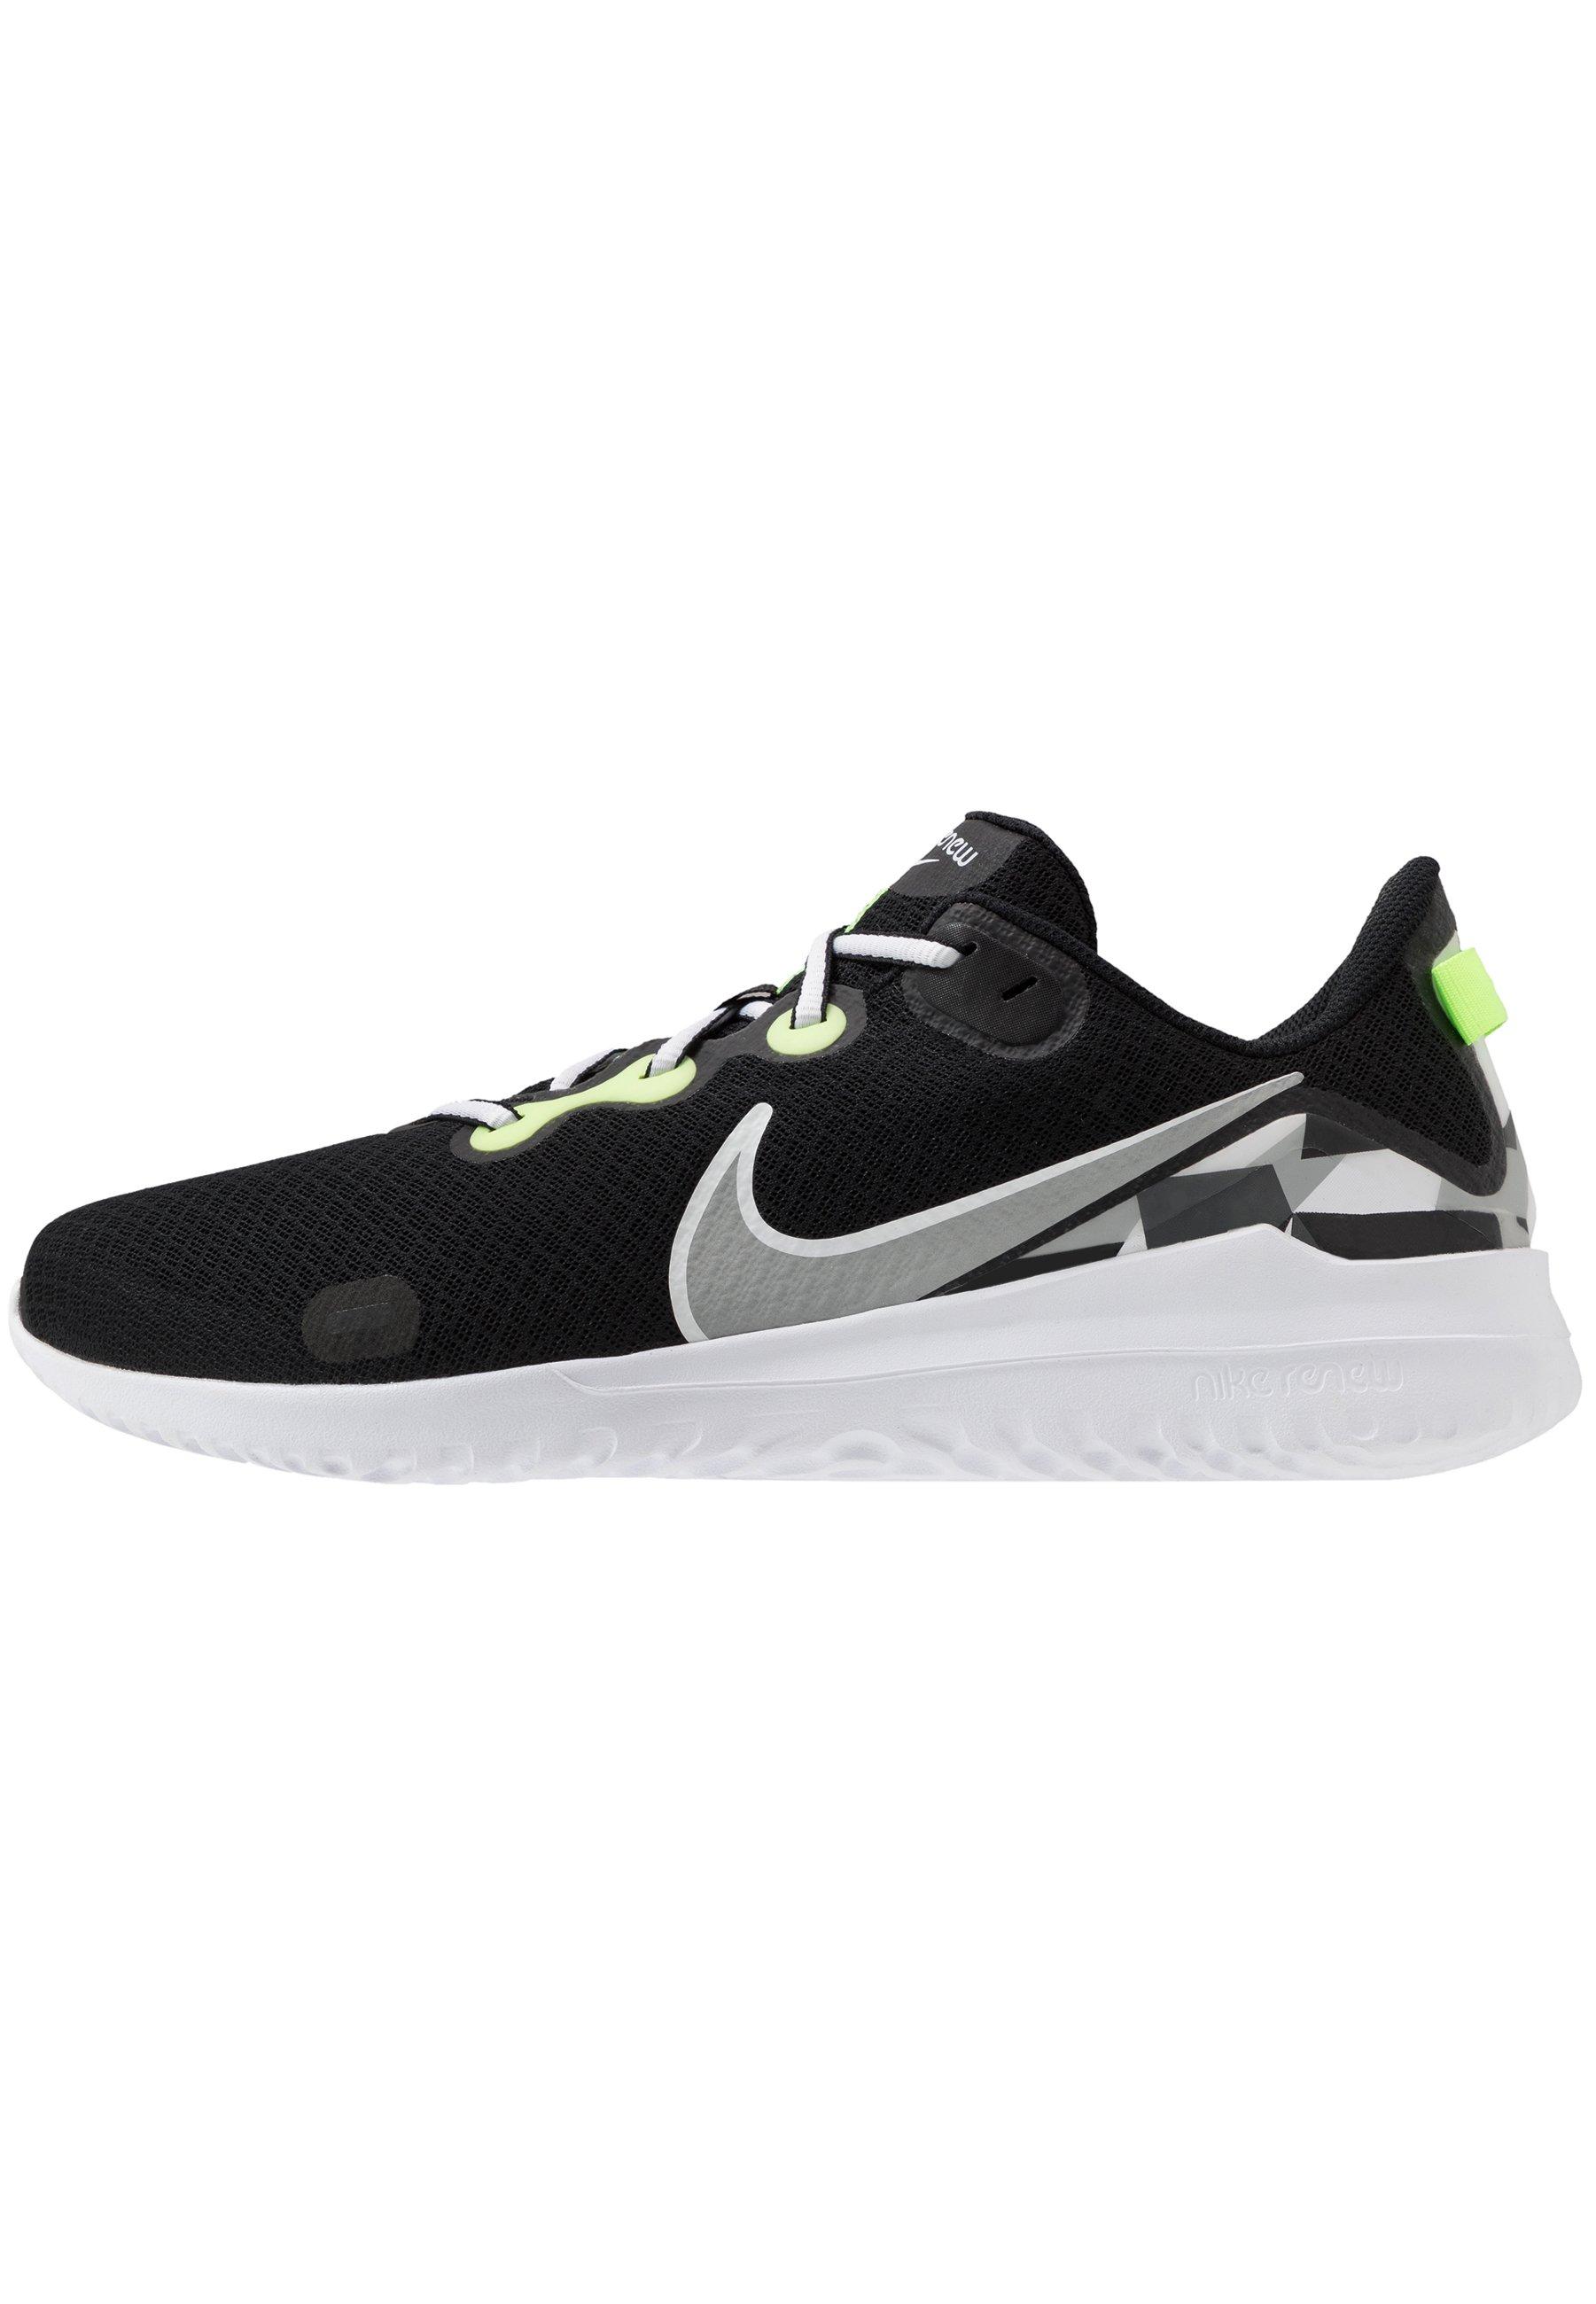 Nike Performance RUN ALL DAY 2 Nøytrale løpesko diffused